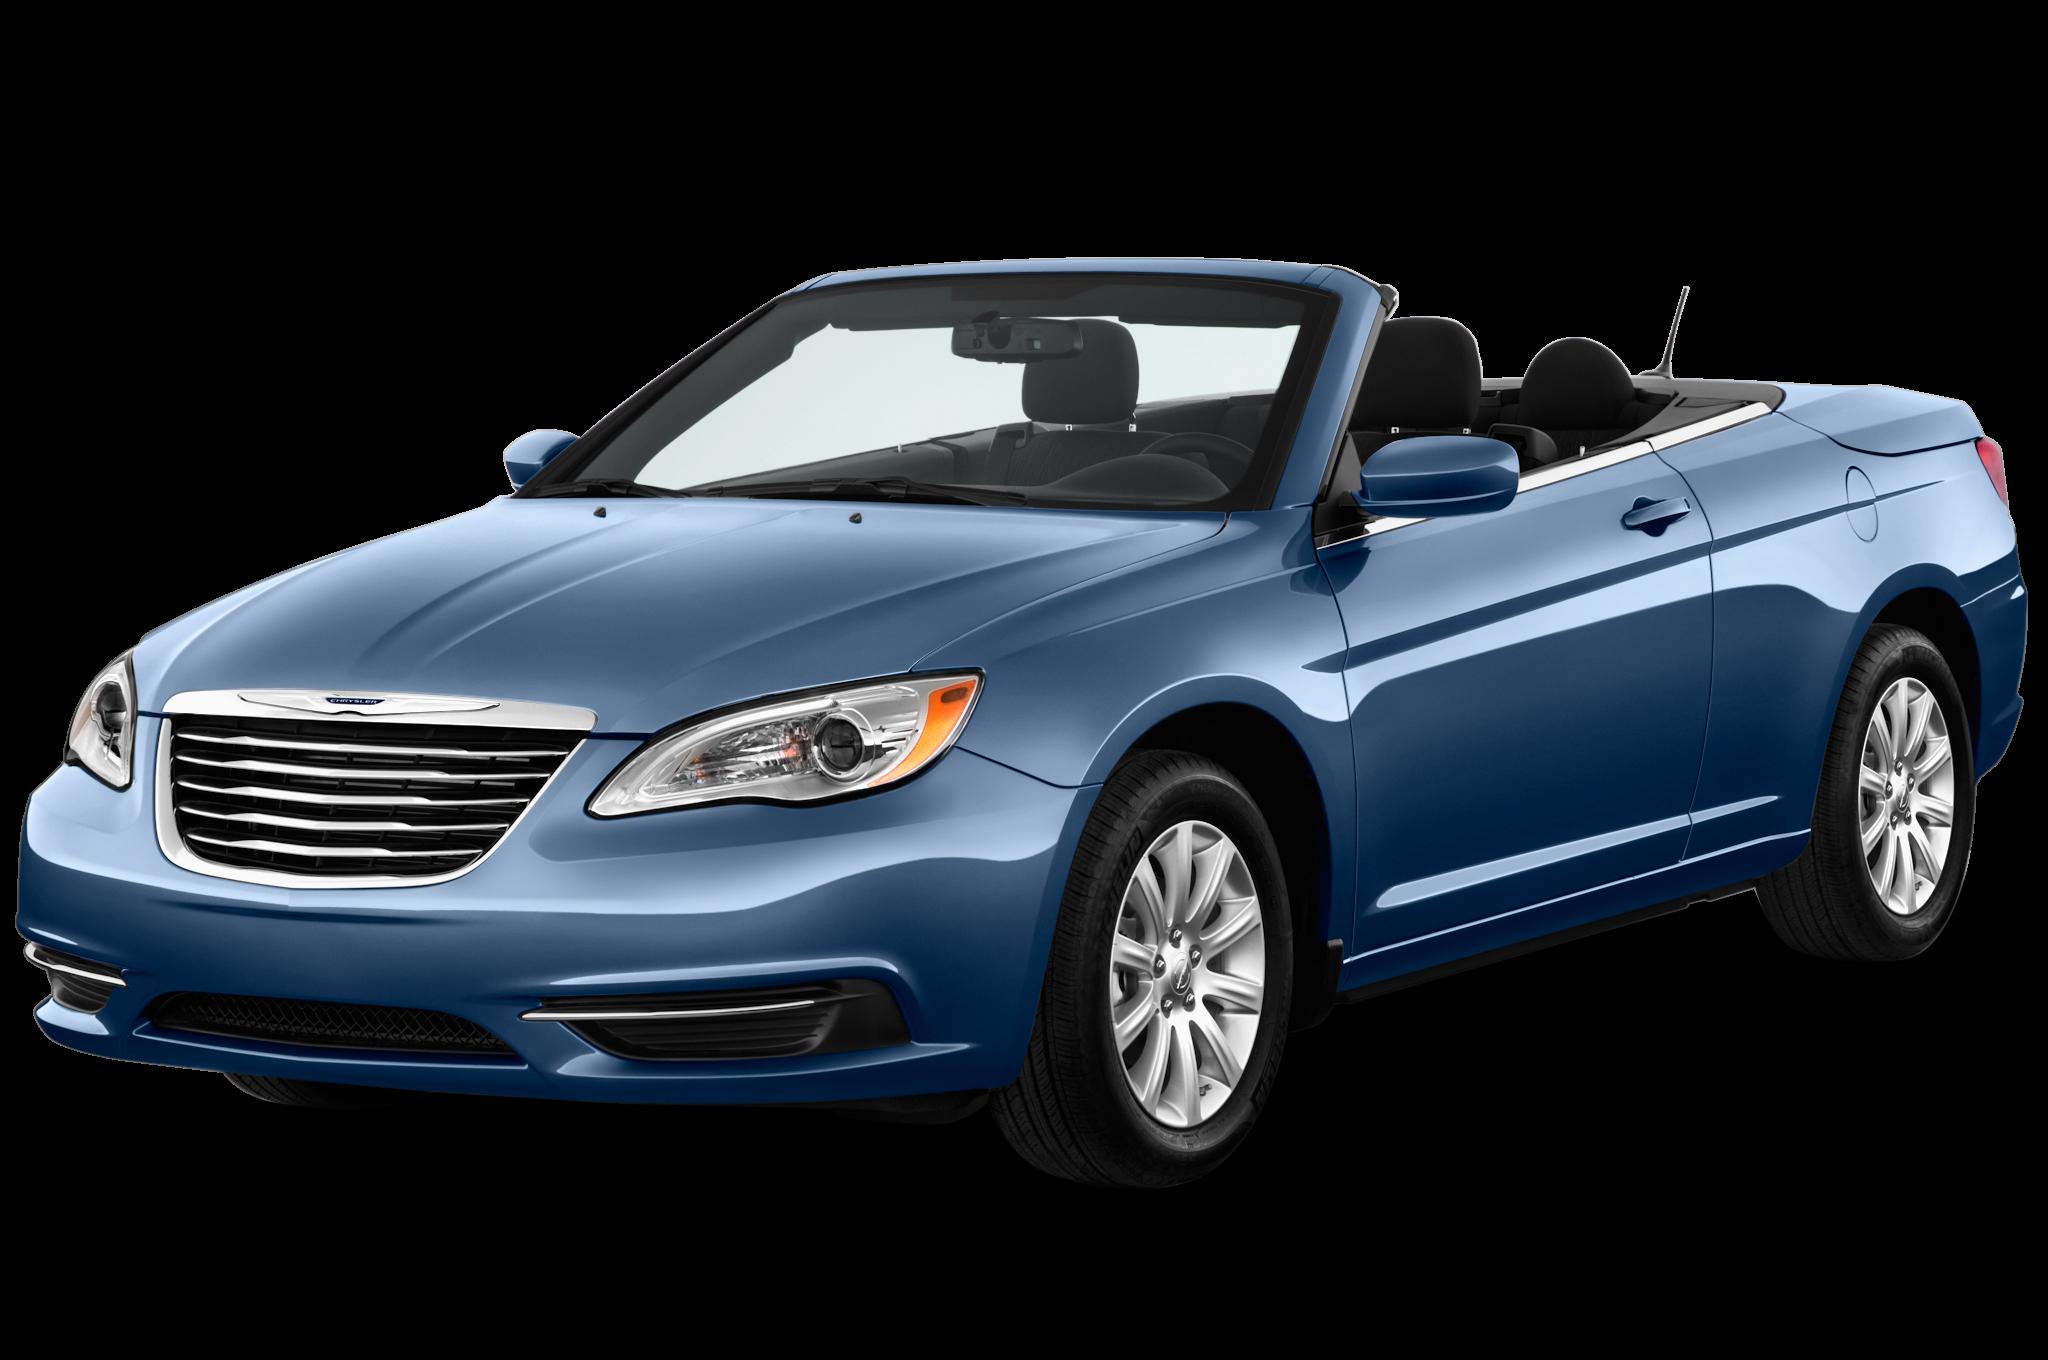 Chrysler 200 2014 - International Price & Overview